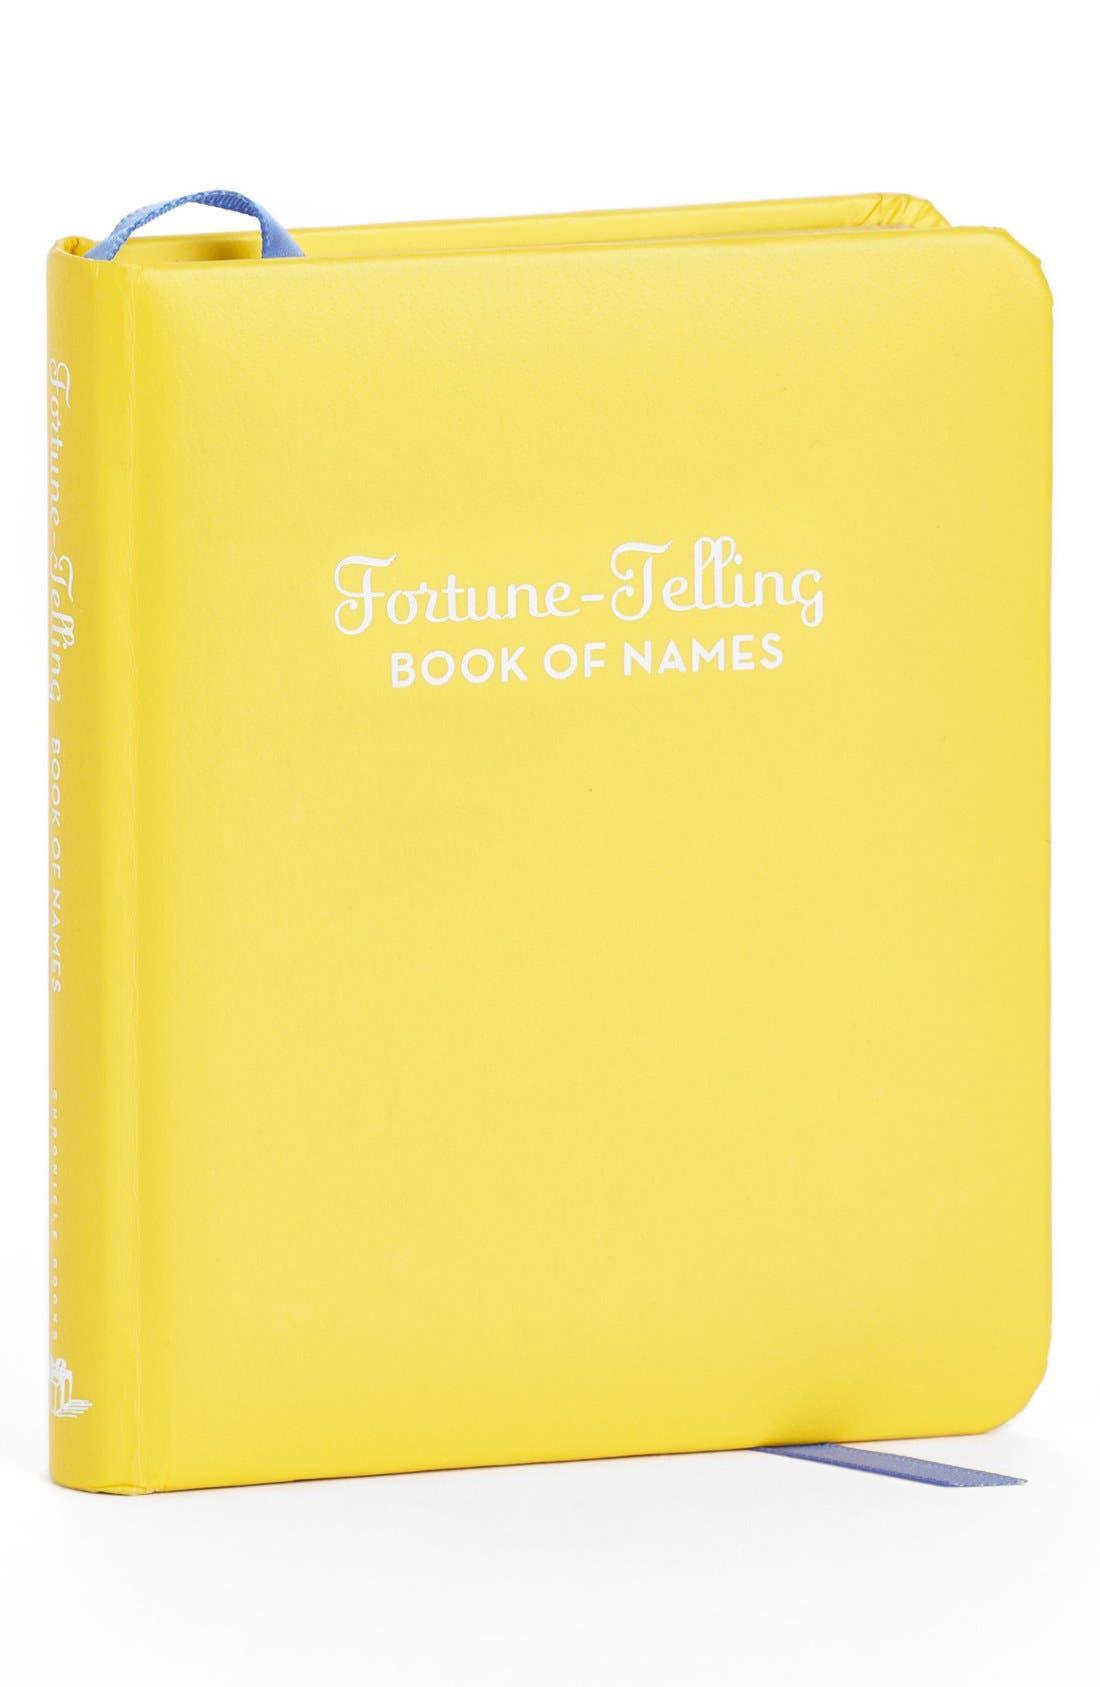 Alternate Image 1 Selected - 'Fortune Telling Book of Names' Book